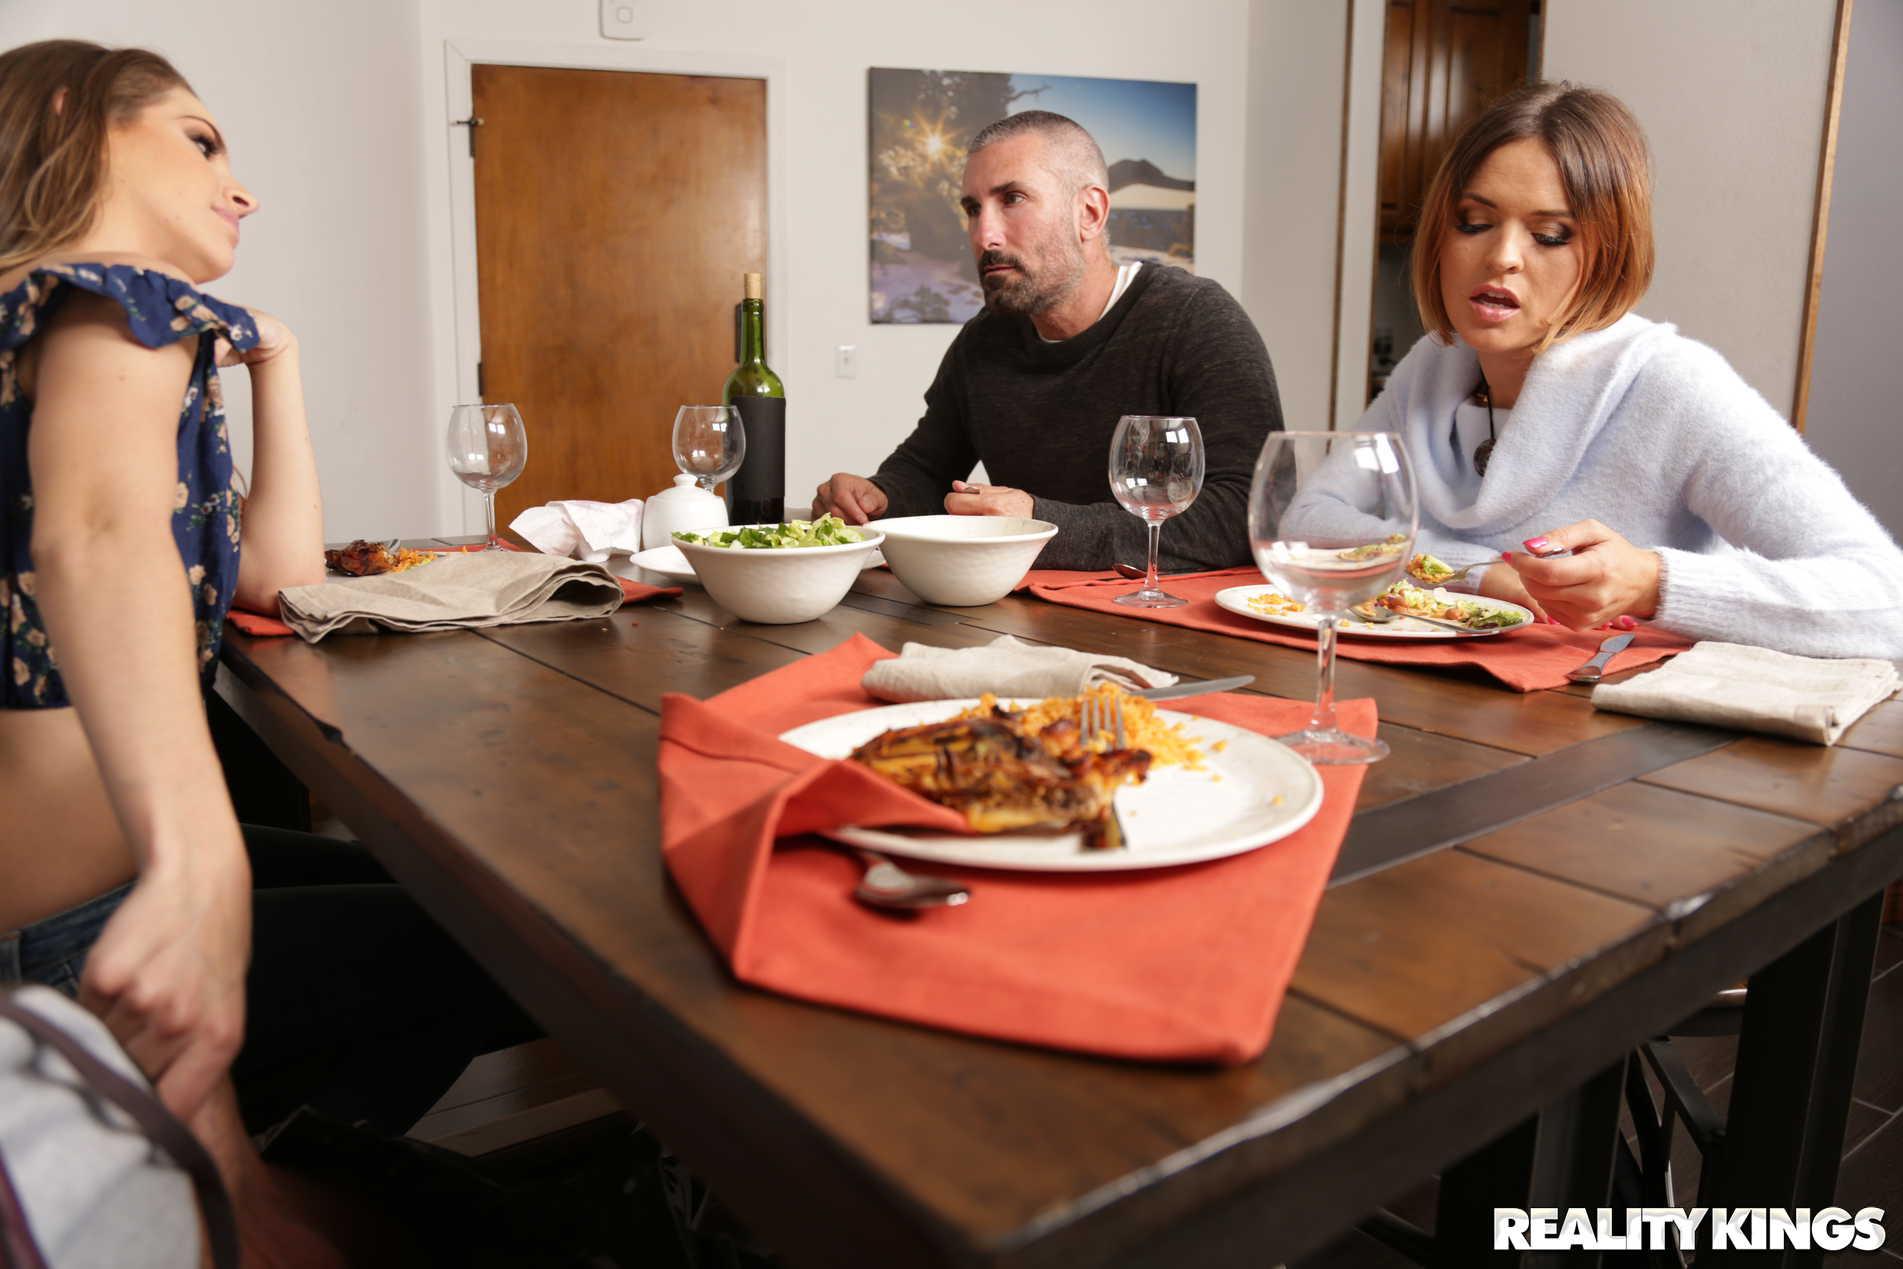 Reality Kings 'My Daughters New Boyfriend' starring Krissy Lynn (Photo 144)